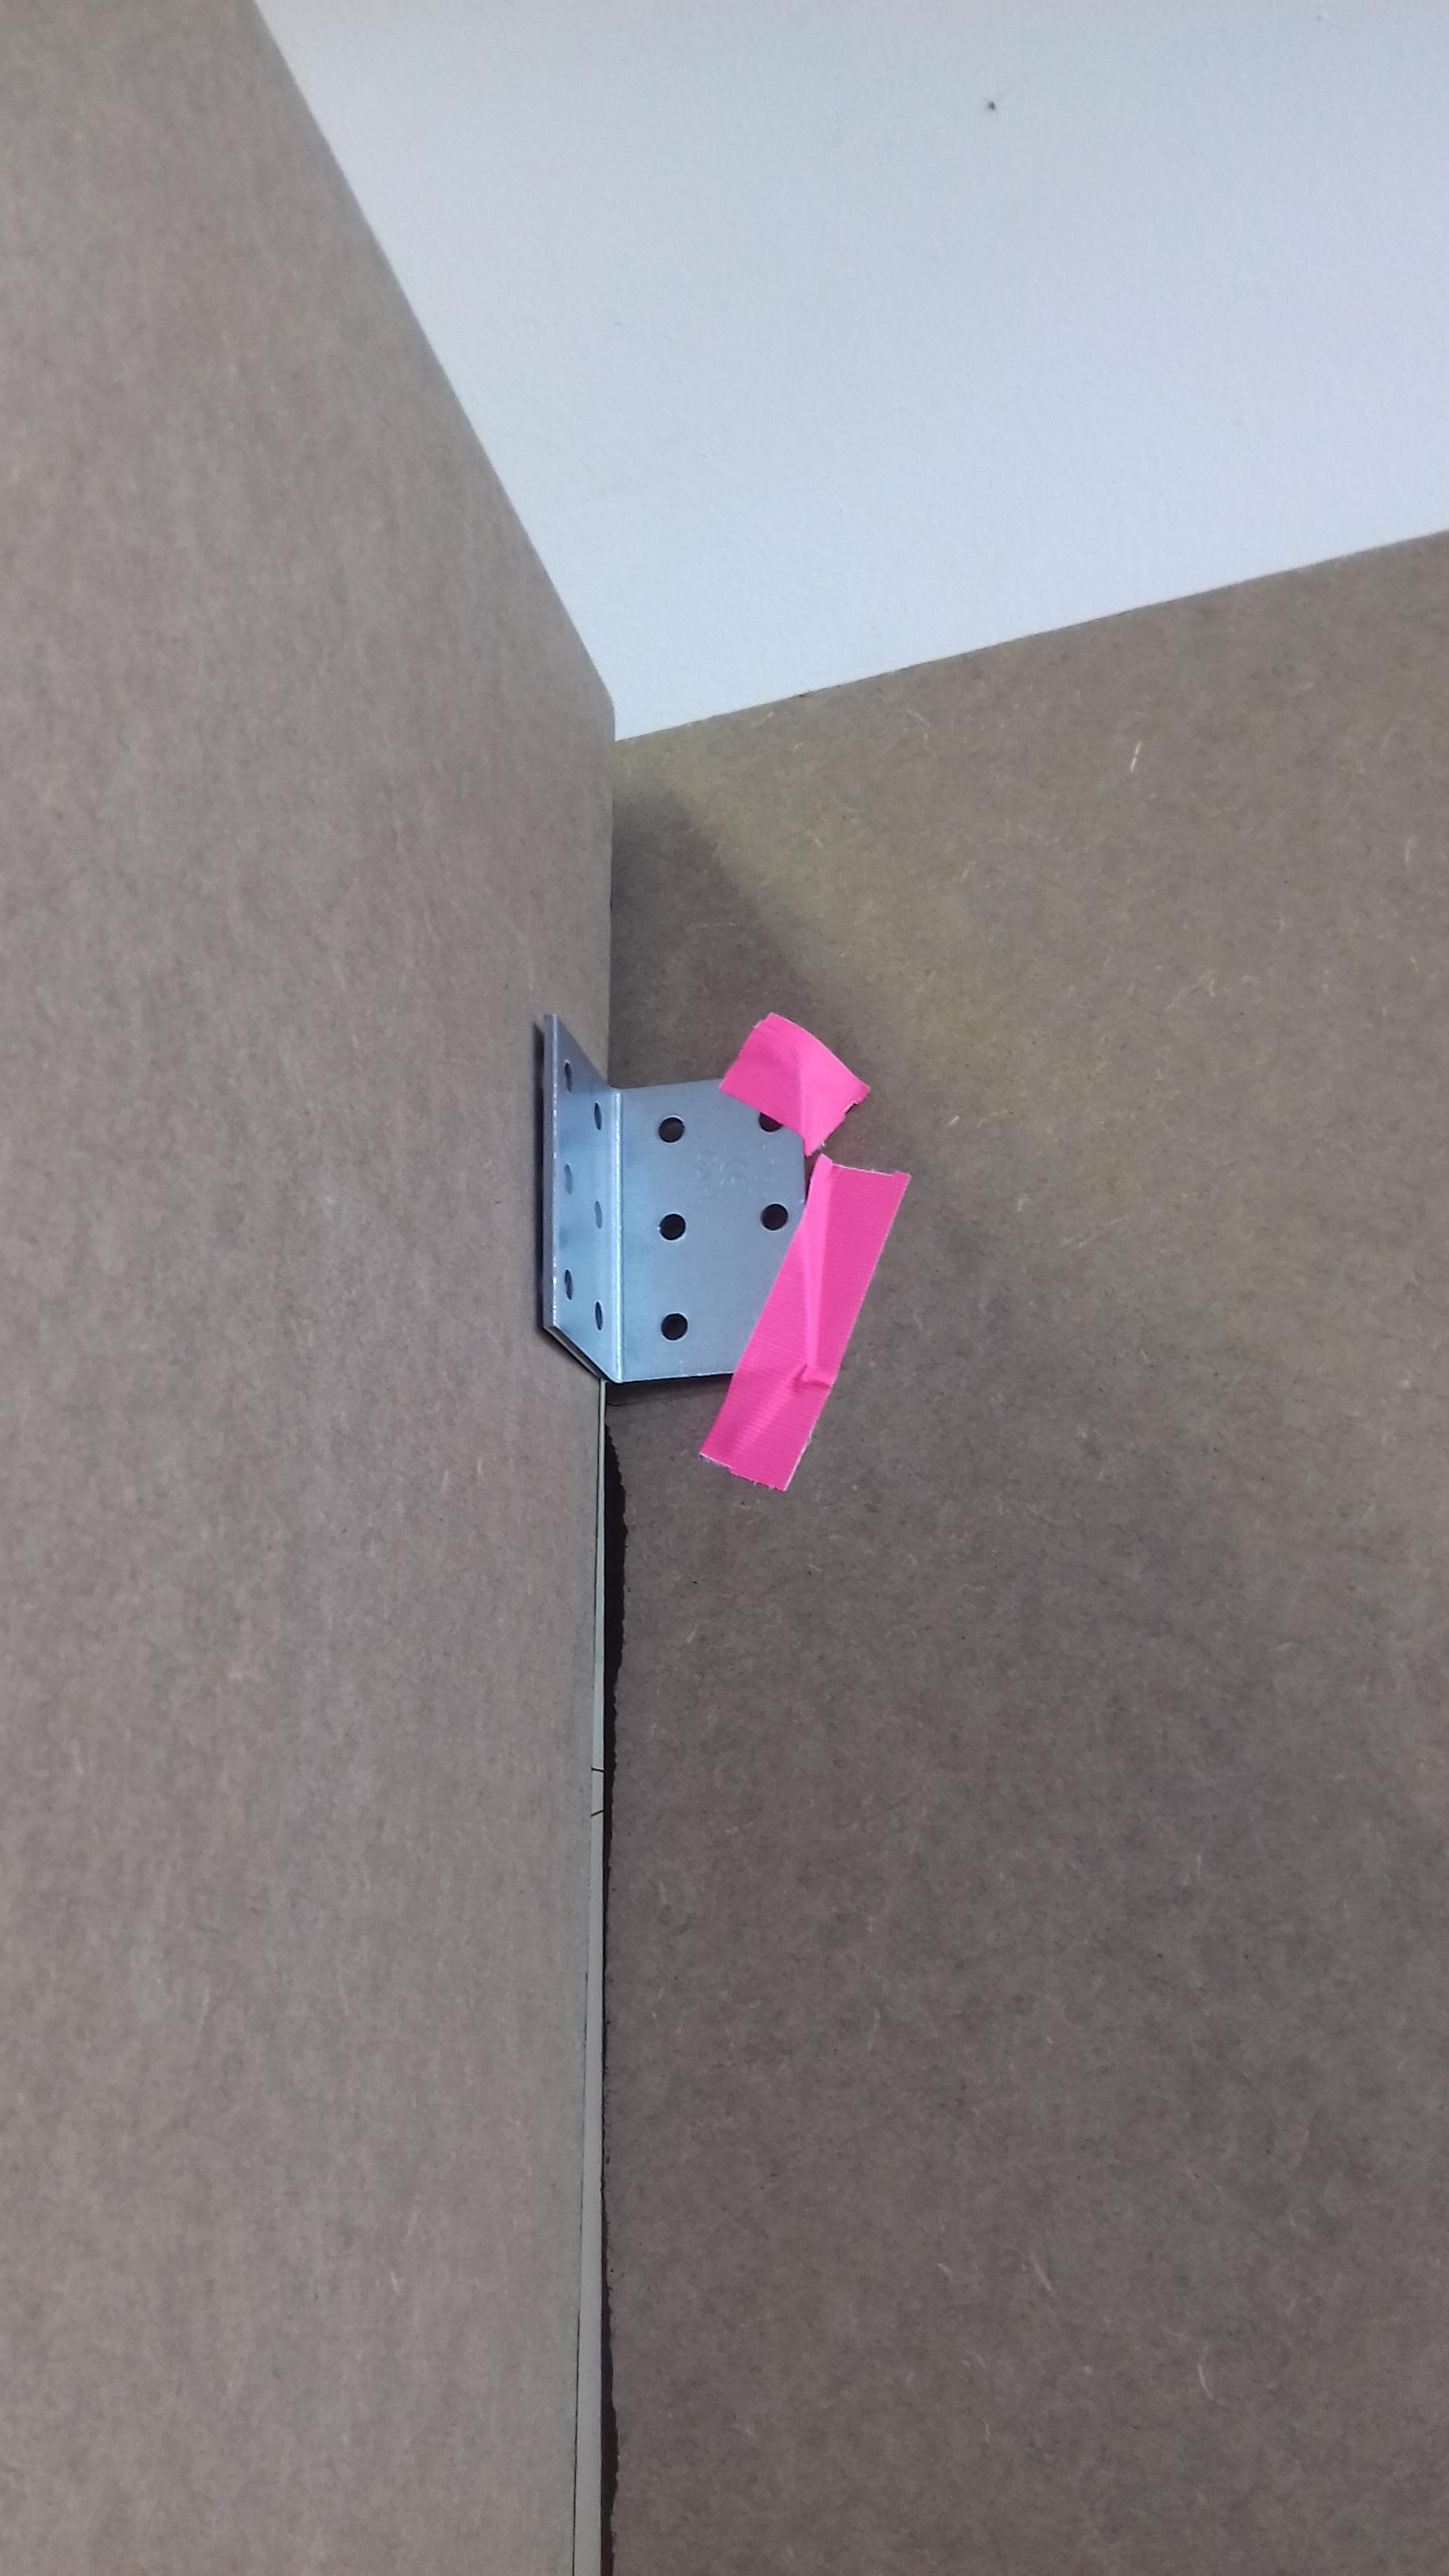 Matt's peep-hole box / construction